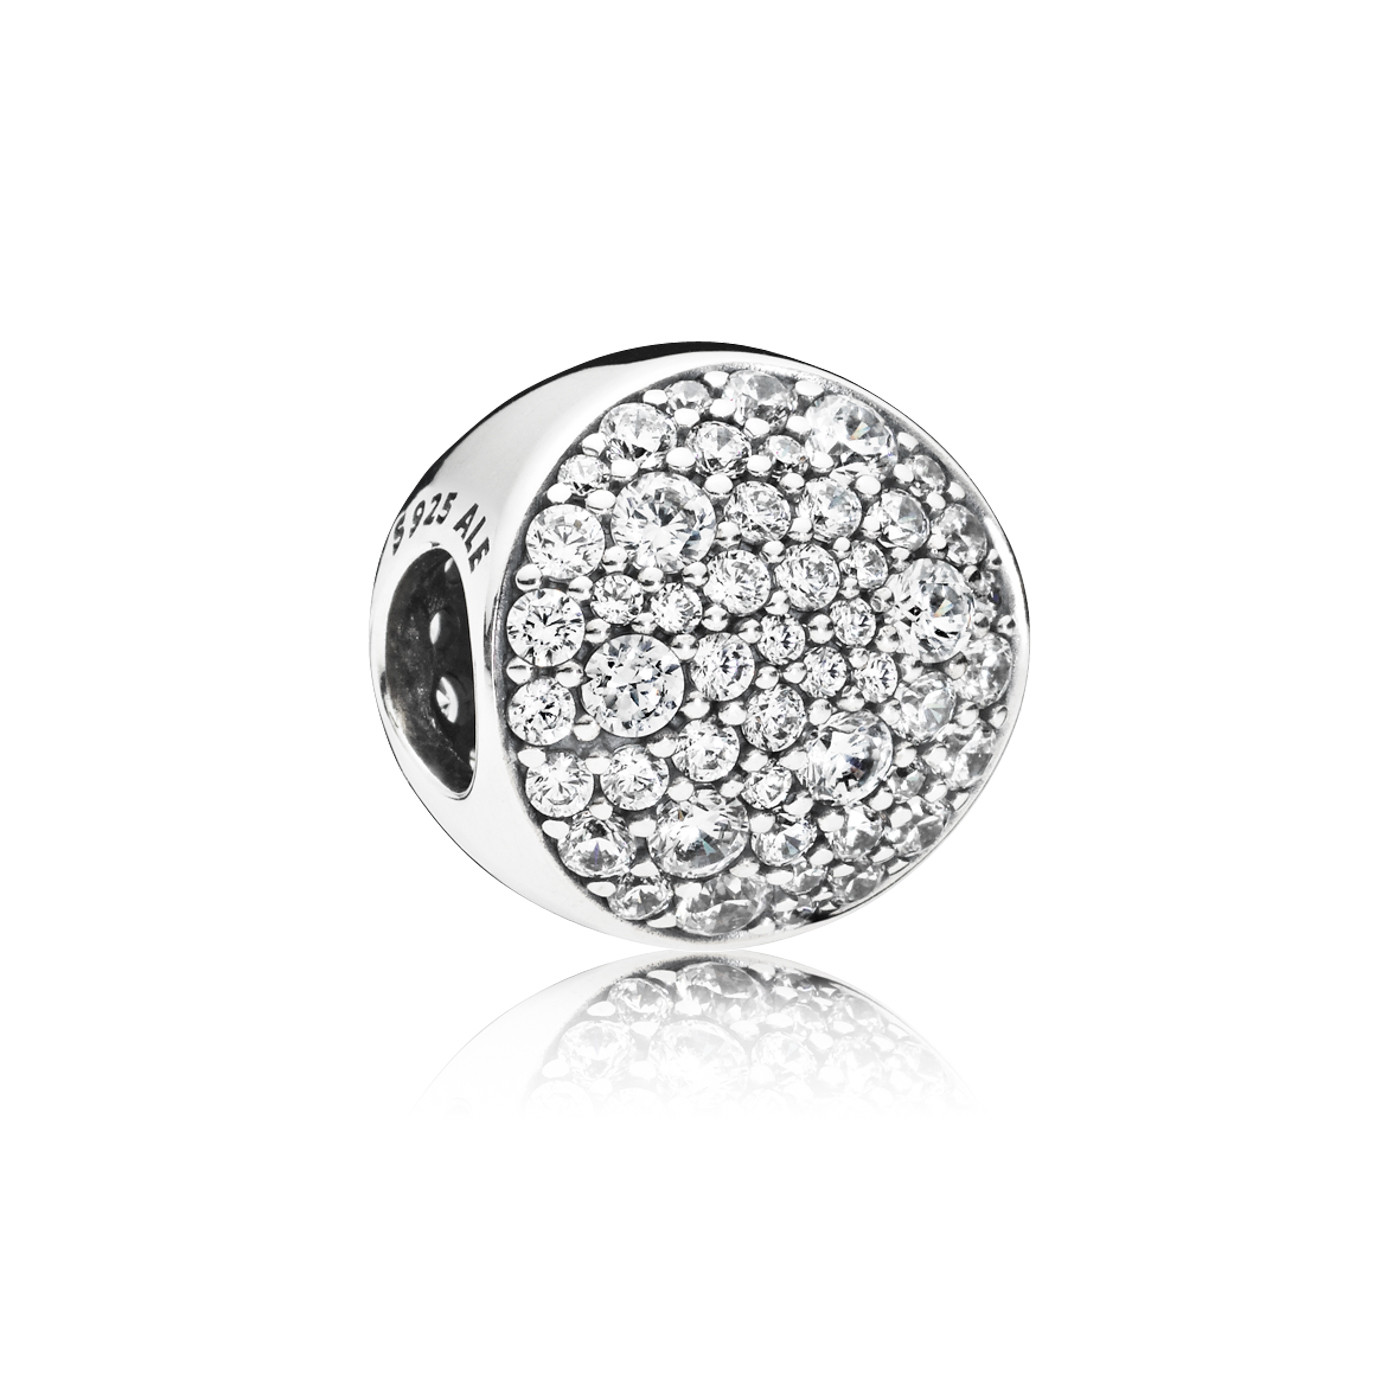 Pandora 925 Sterling Zilveren Abstract Pave Bedel 797540CZ